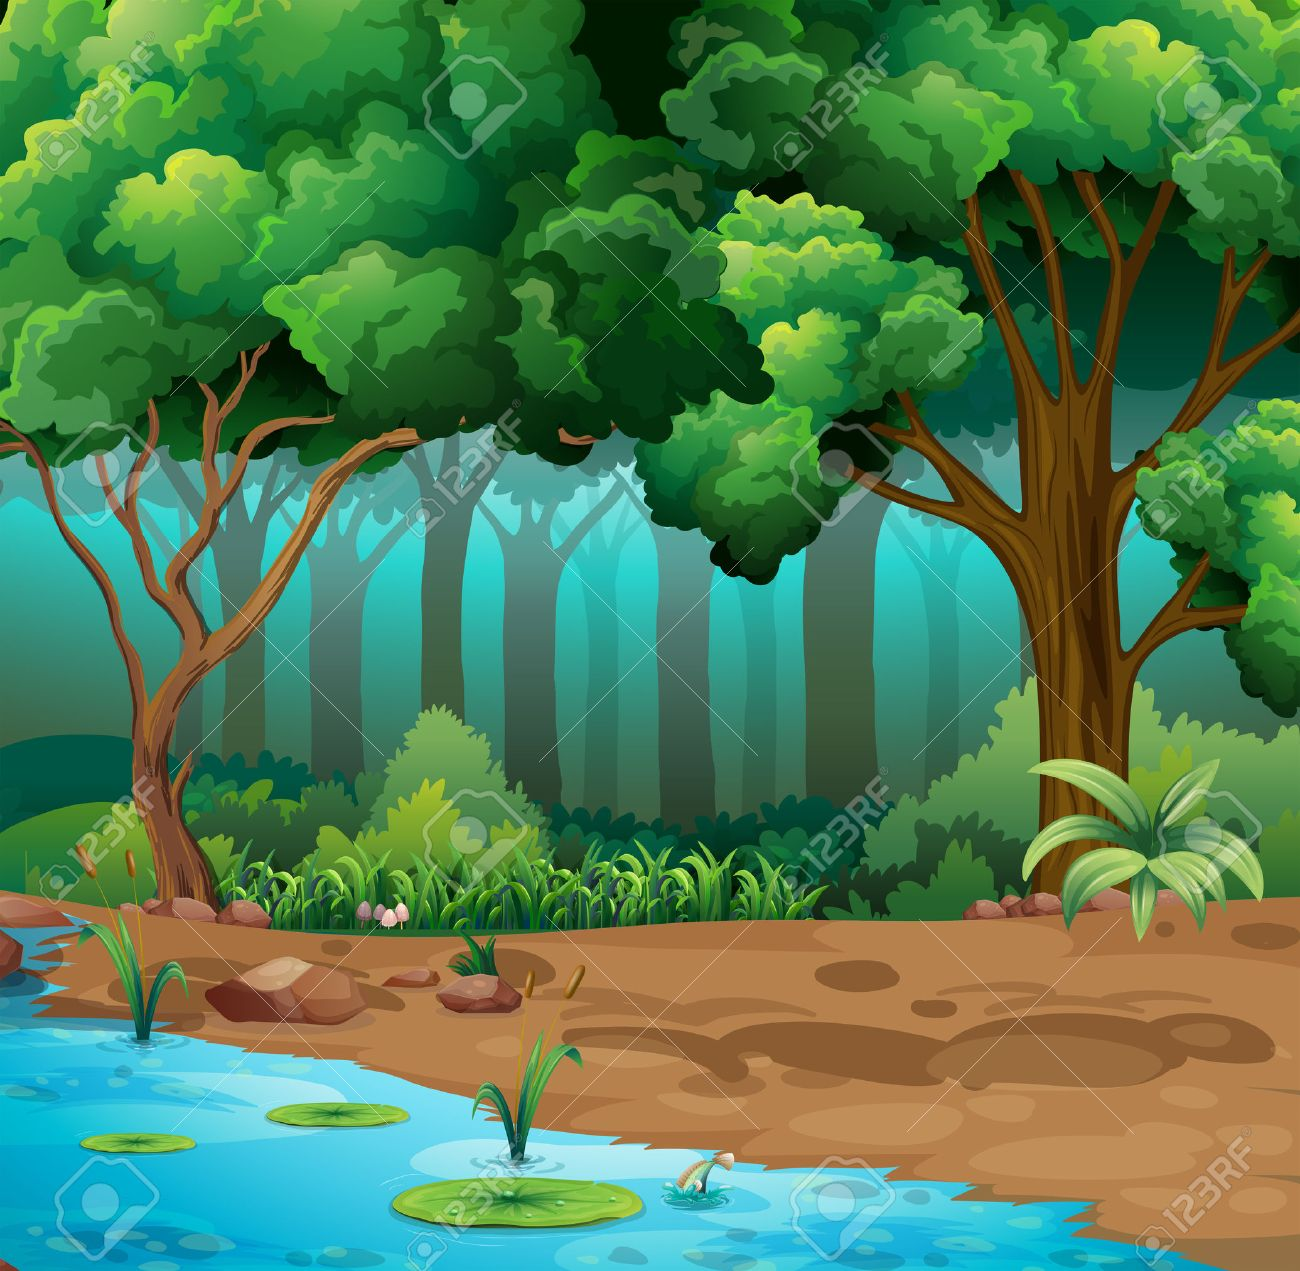 River run through the jungle illustration.